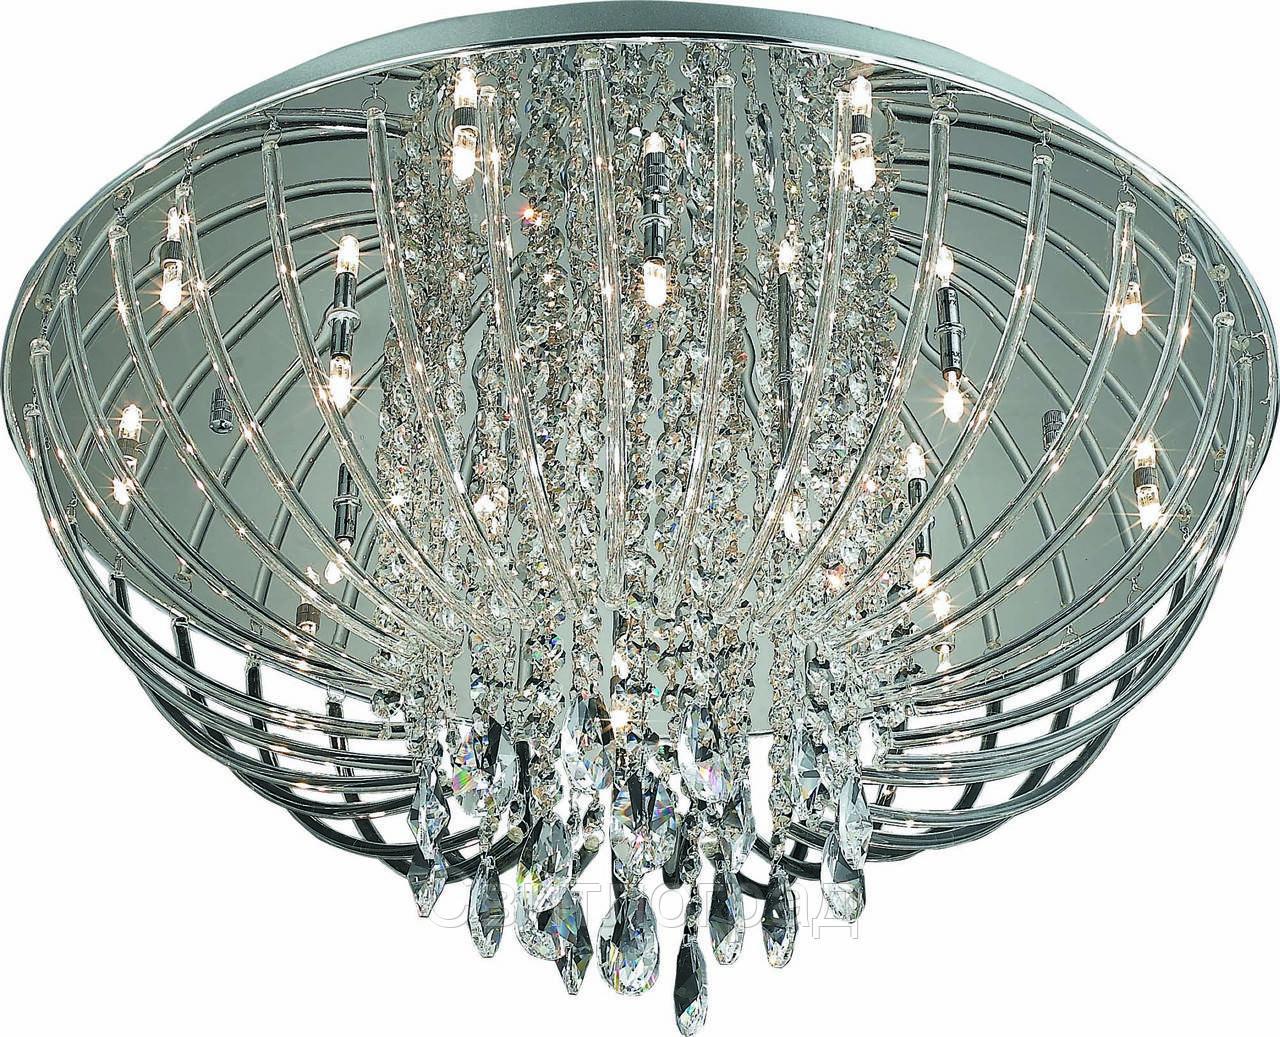 Люстра Хрустальная   Светильник Потолочный Altalusse INL-4108C-18 Chrome & LED